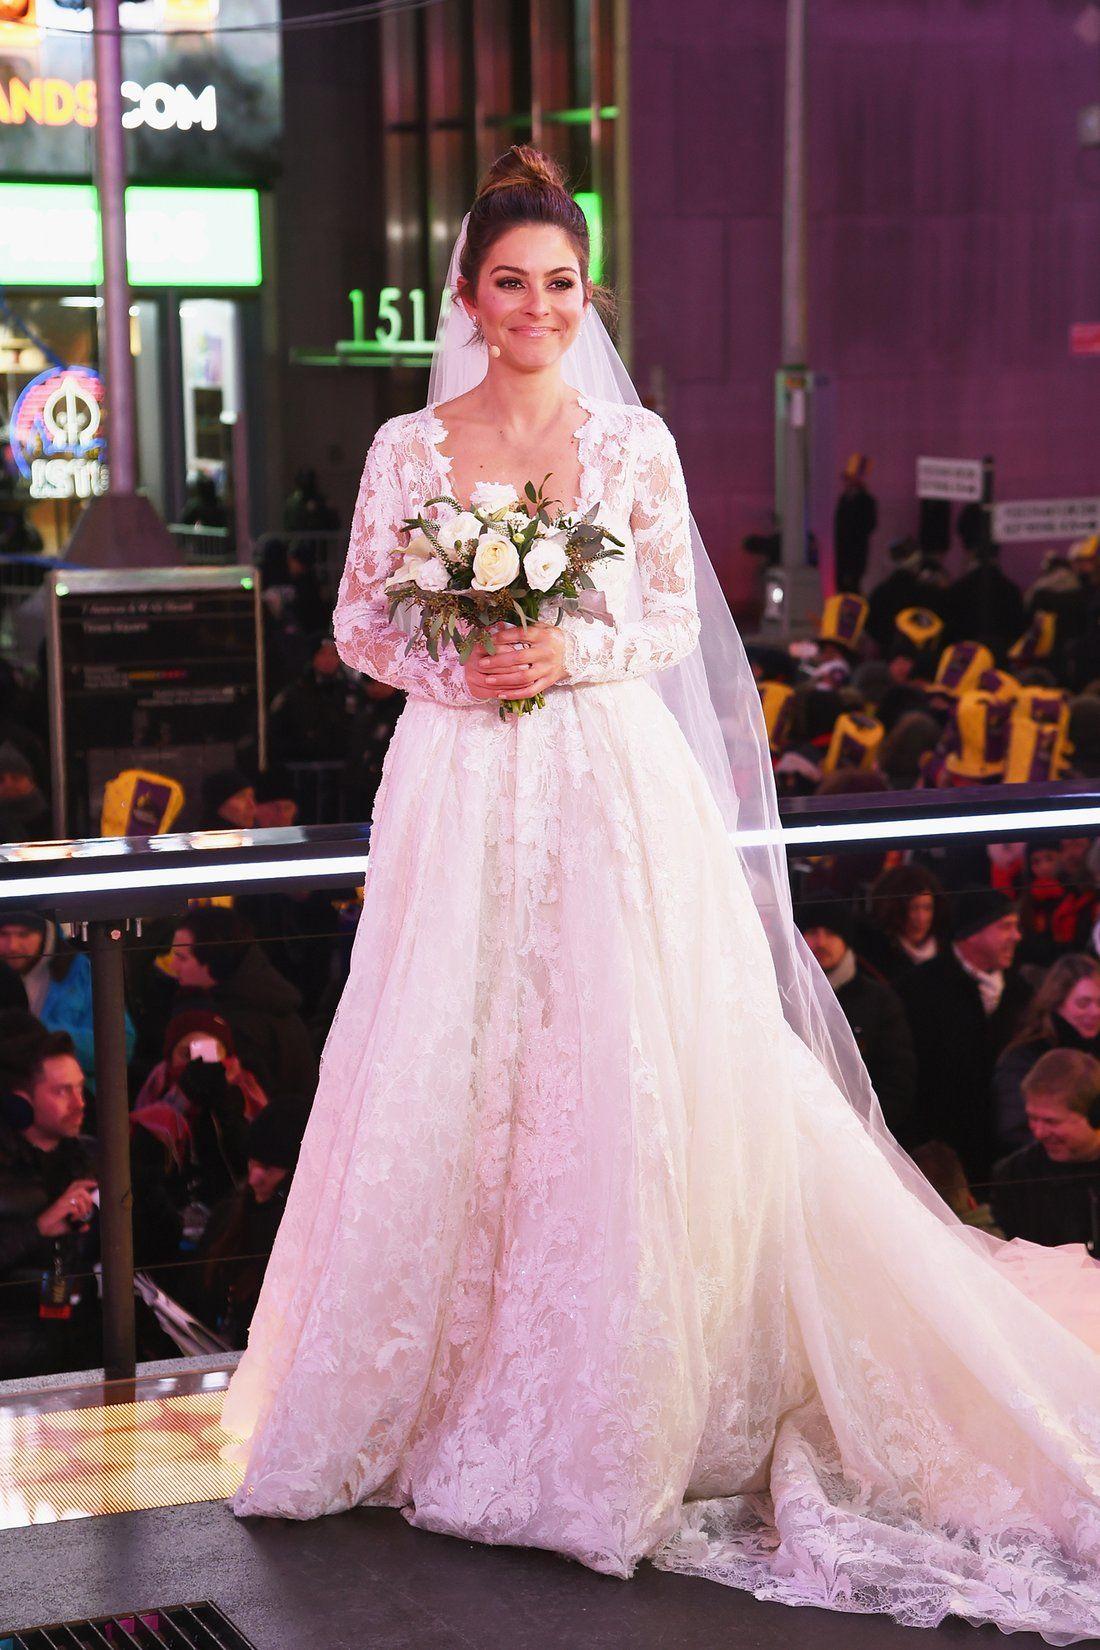 Maria Menounos On Her New Year S Eve Wedding Dress It Took My Breath Away Wedding Dresses Pronovias Wedding Dress New Years Eve Weddings